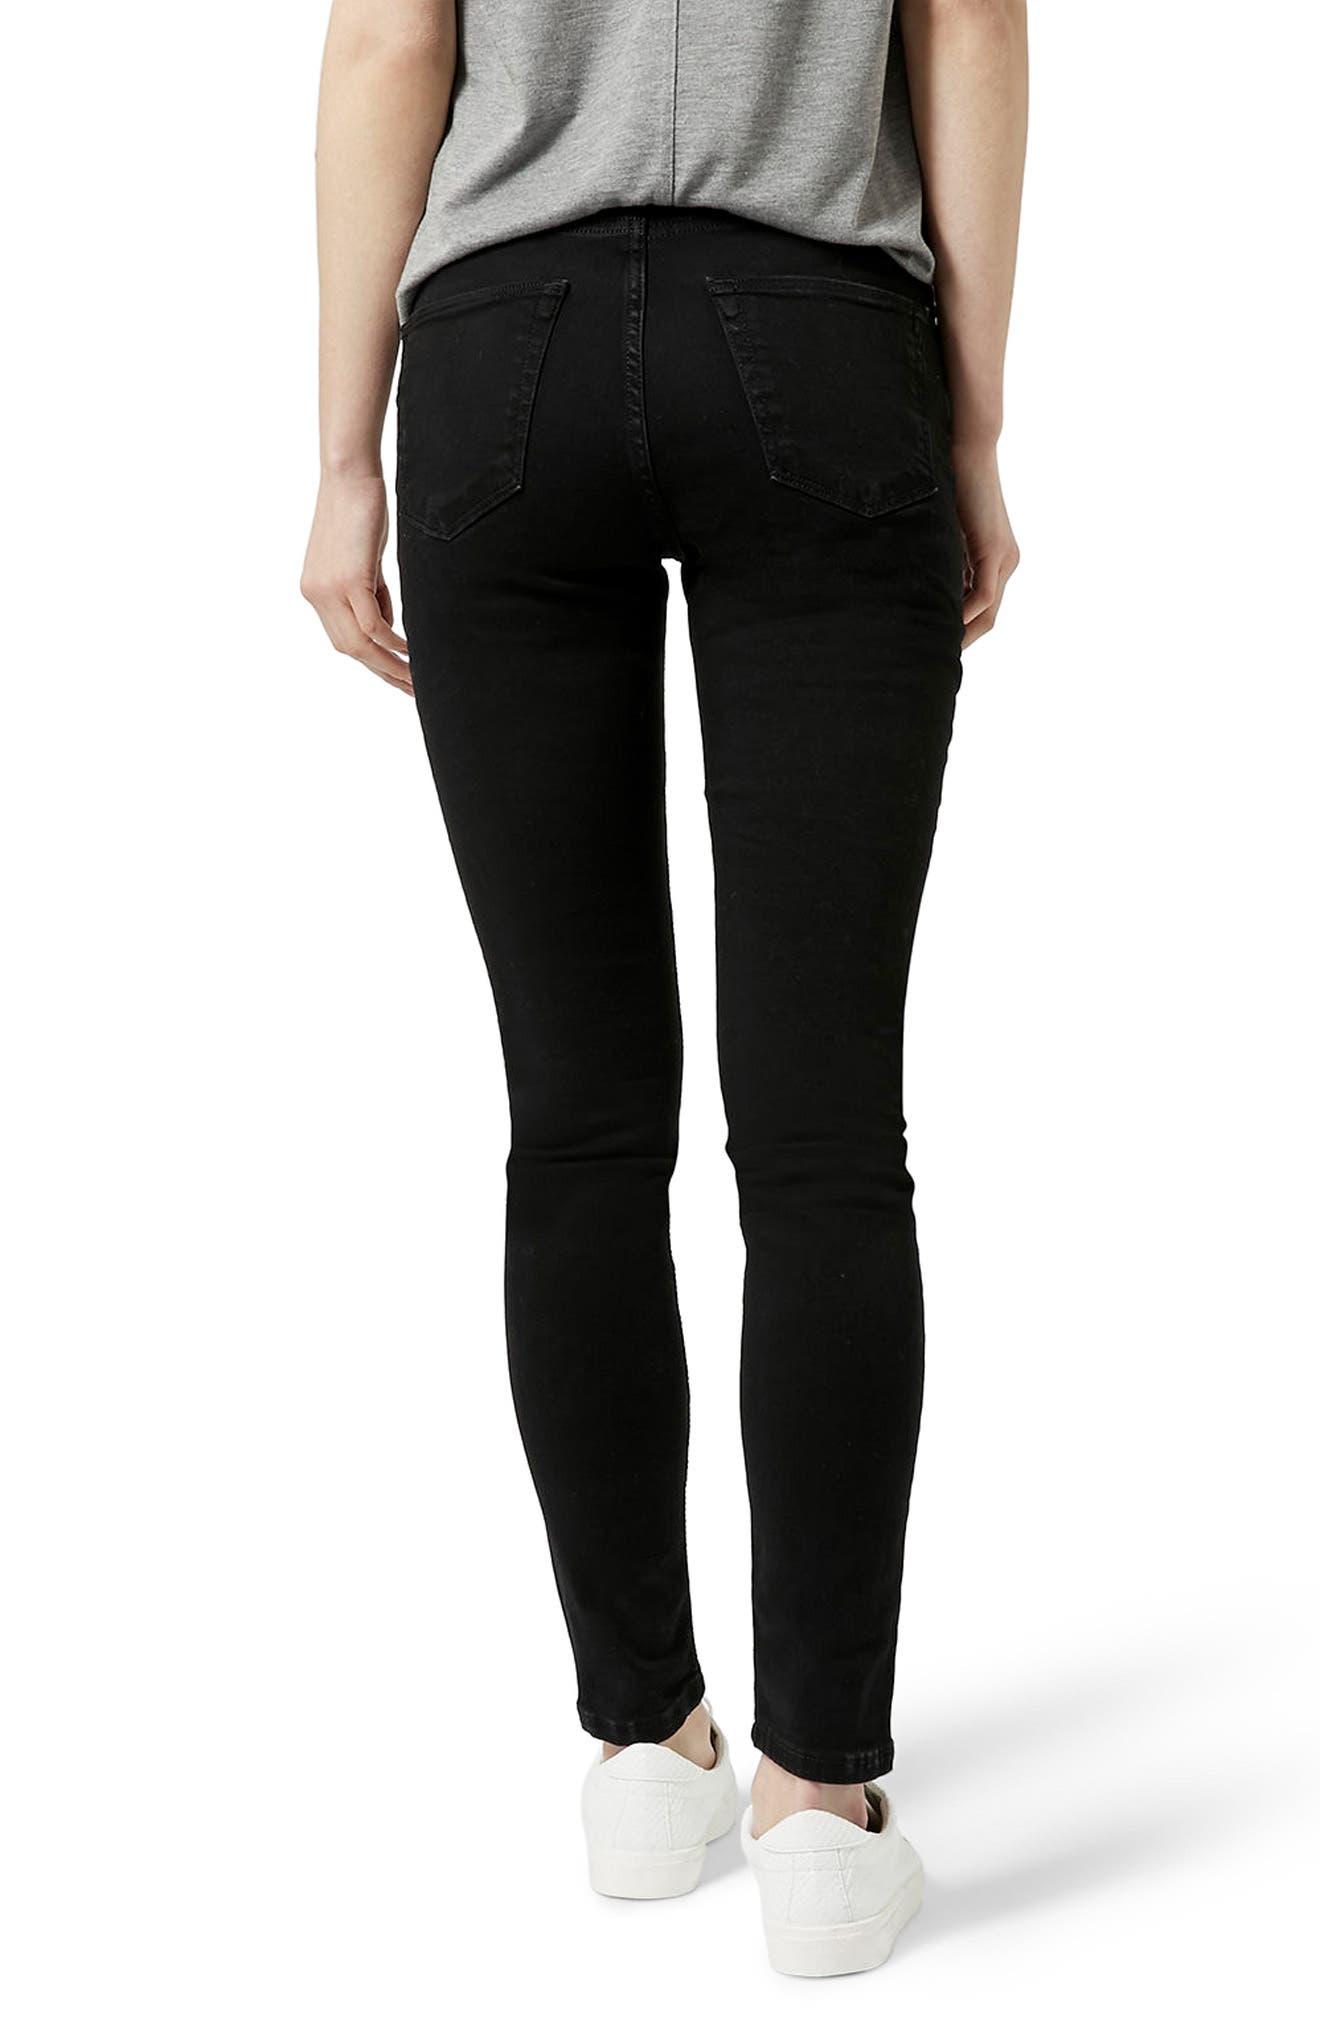 Moto Jamie Ripped Jeans,                             Alternate thumbnail 2, color,                             BLACK